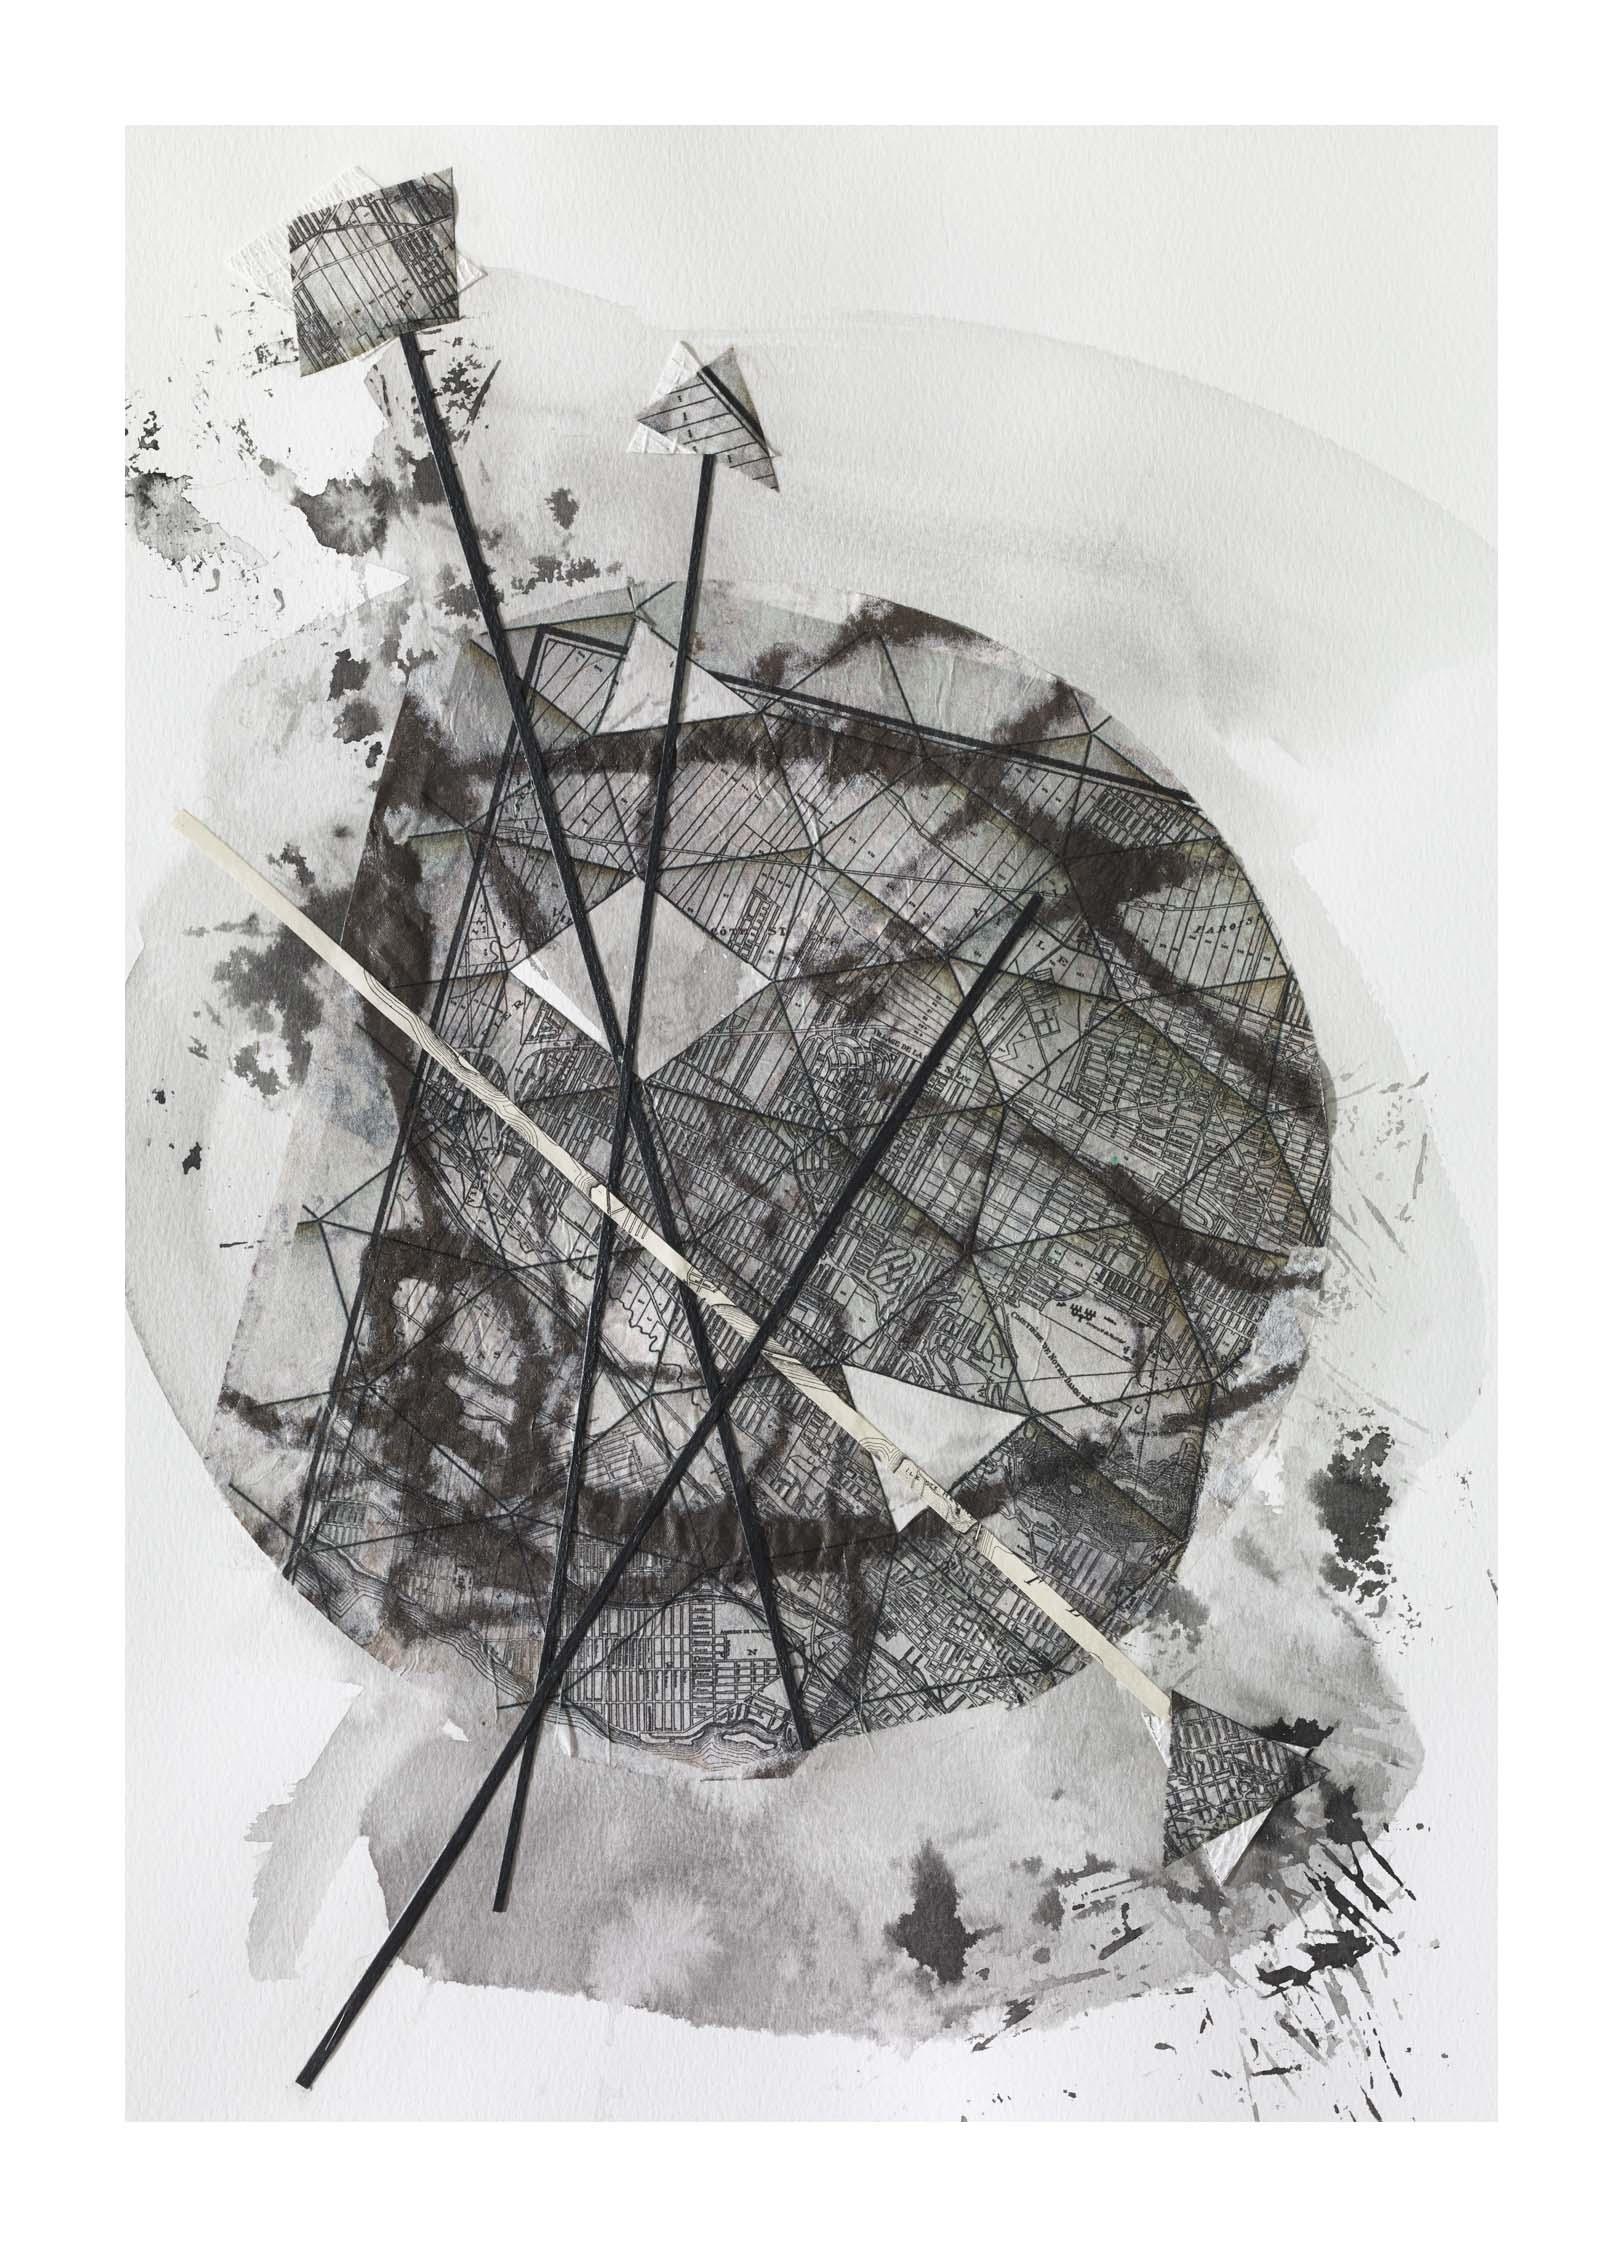 Emergence by St. Paul, MN multimedia artist, Amy Tillotson